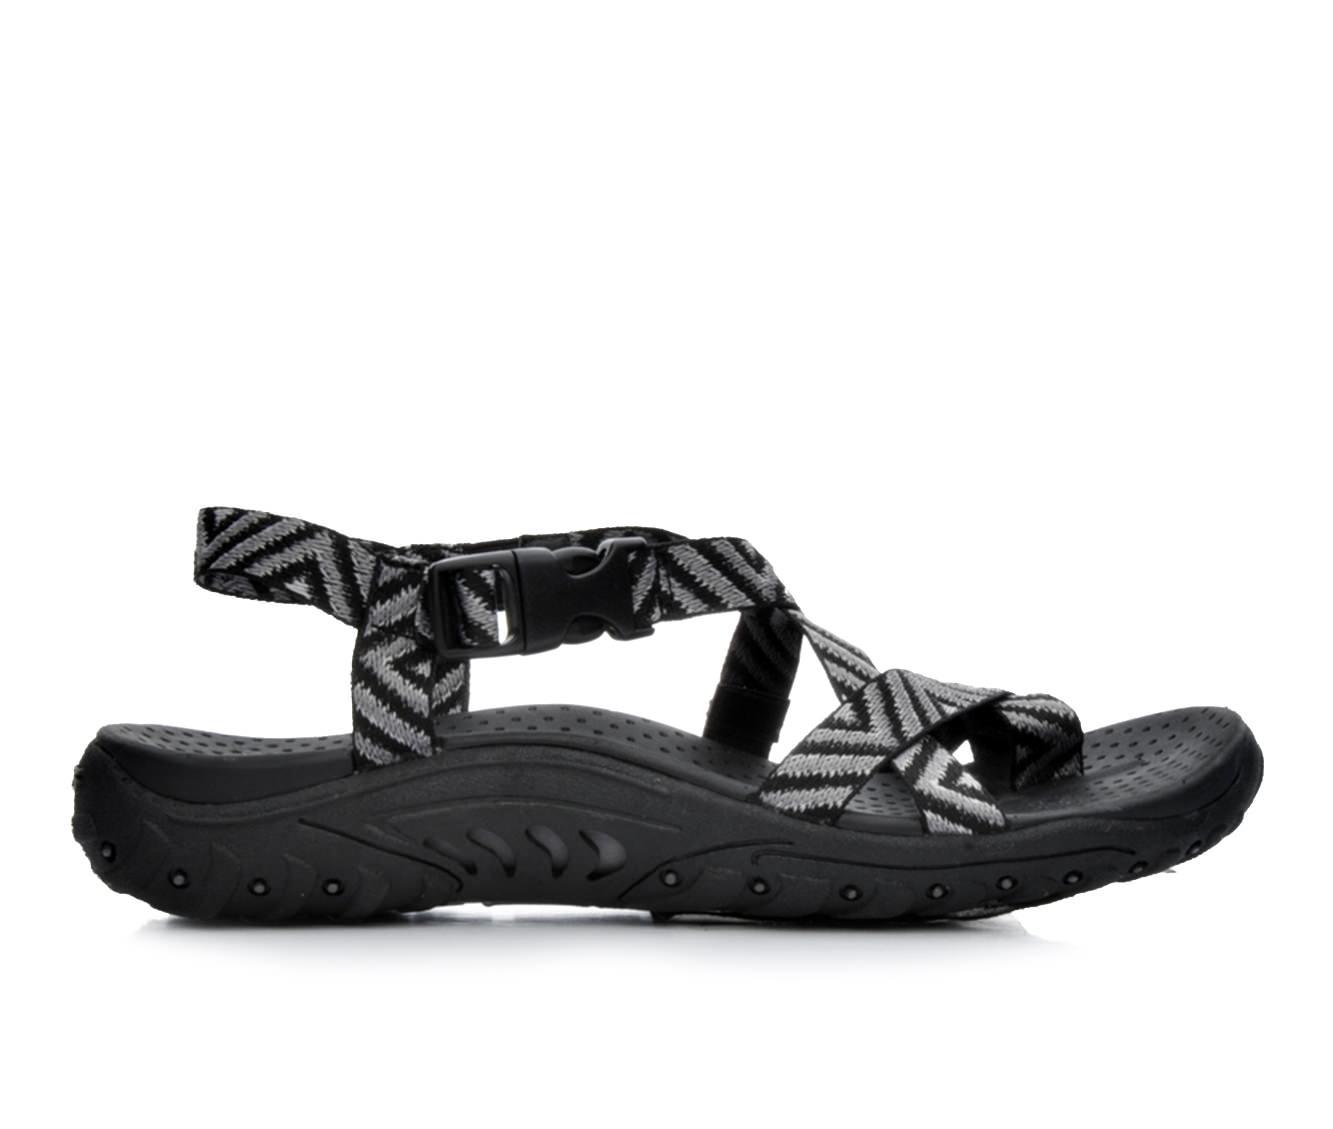 Women's Skechers Reggae Haystack 40872 Sandals (Black)